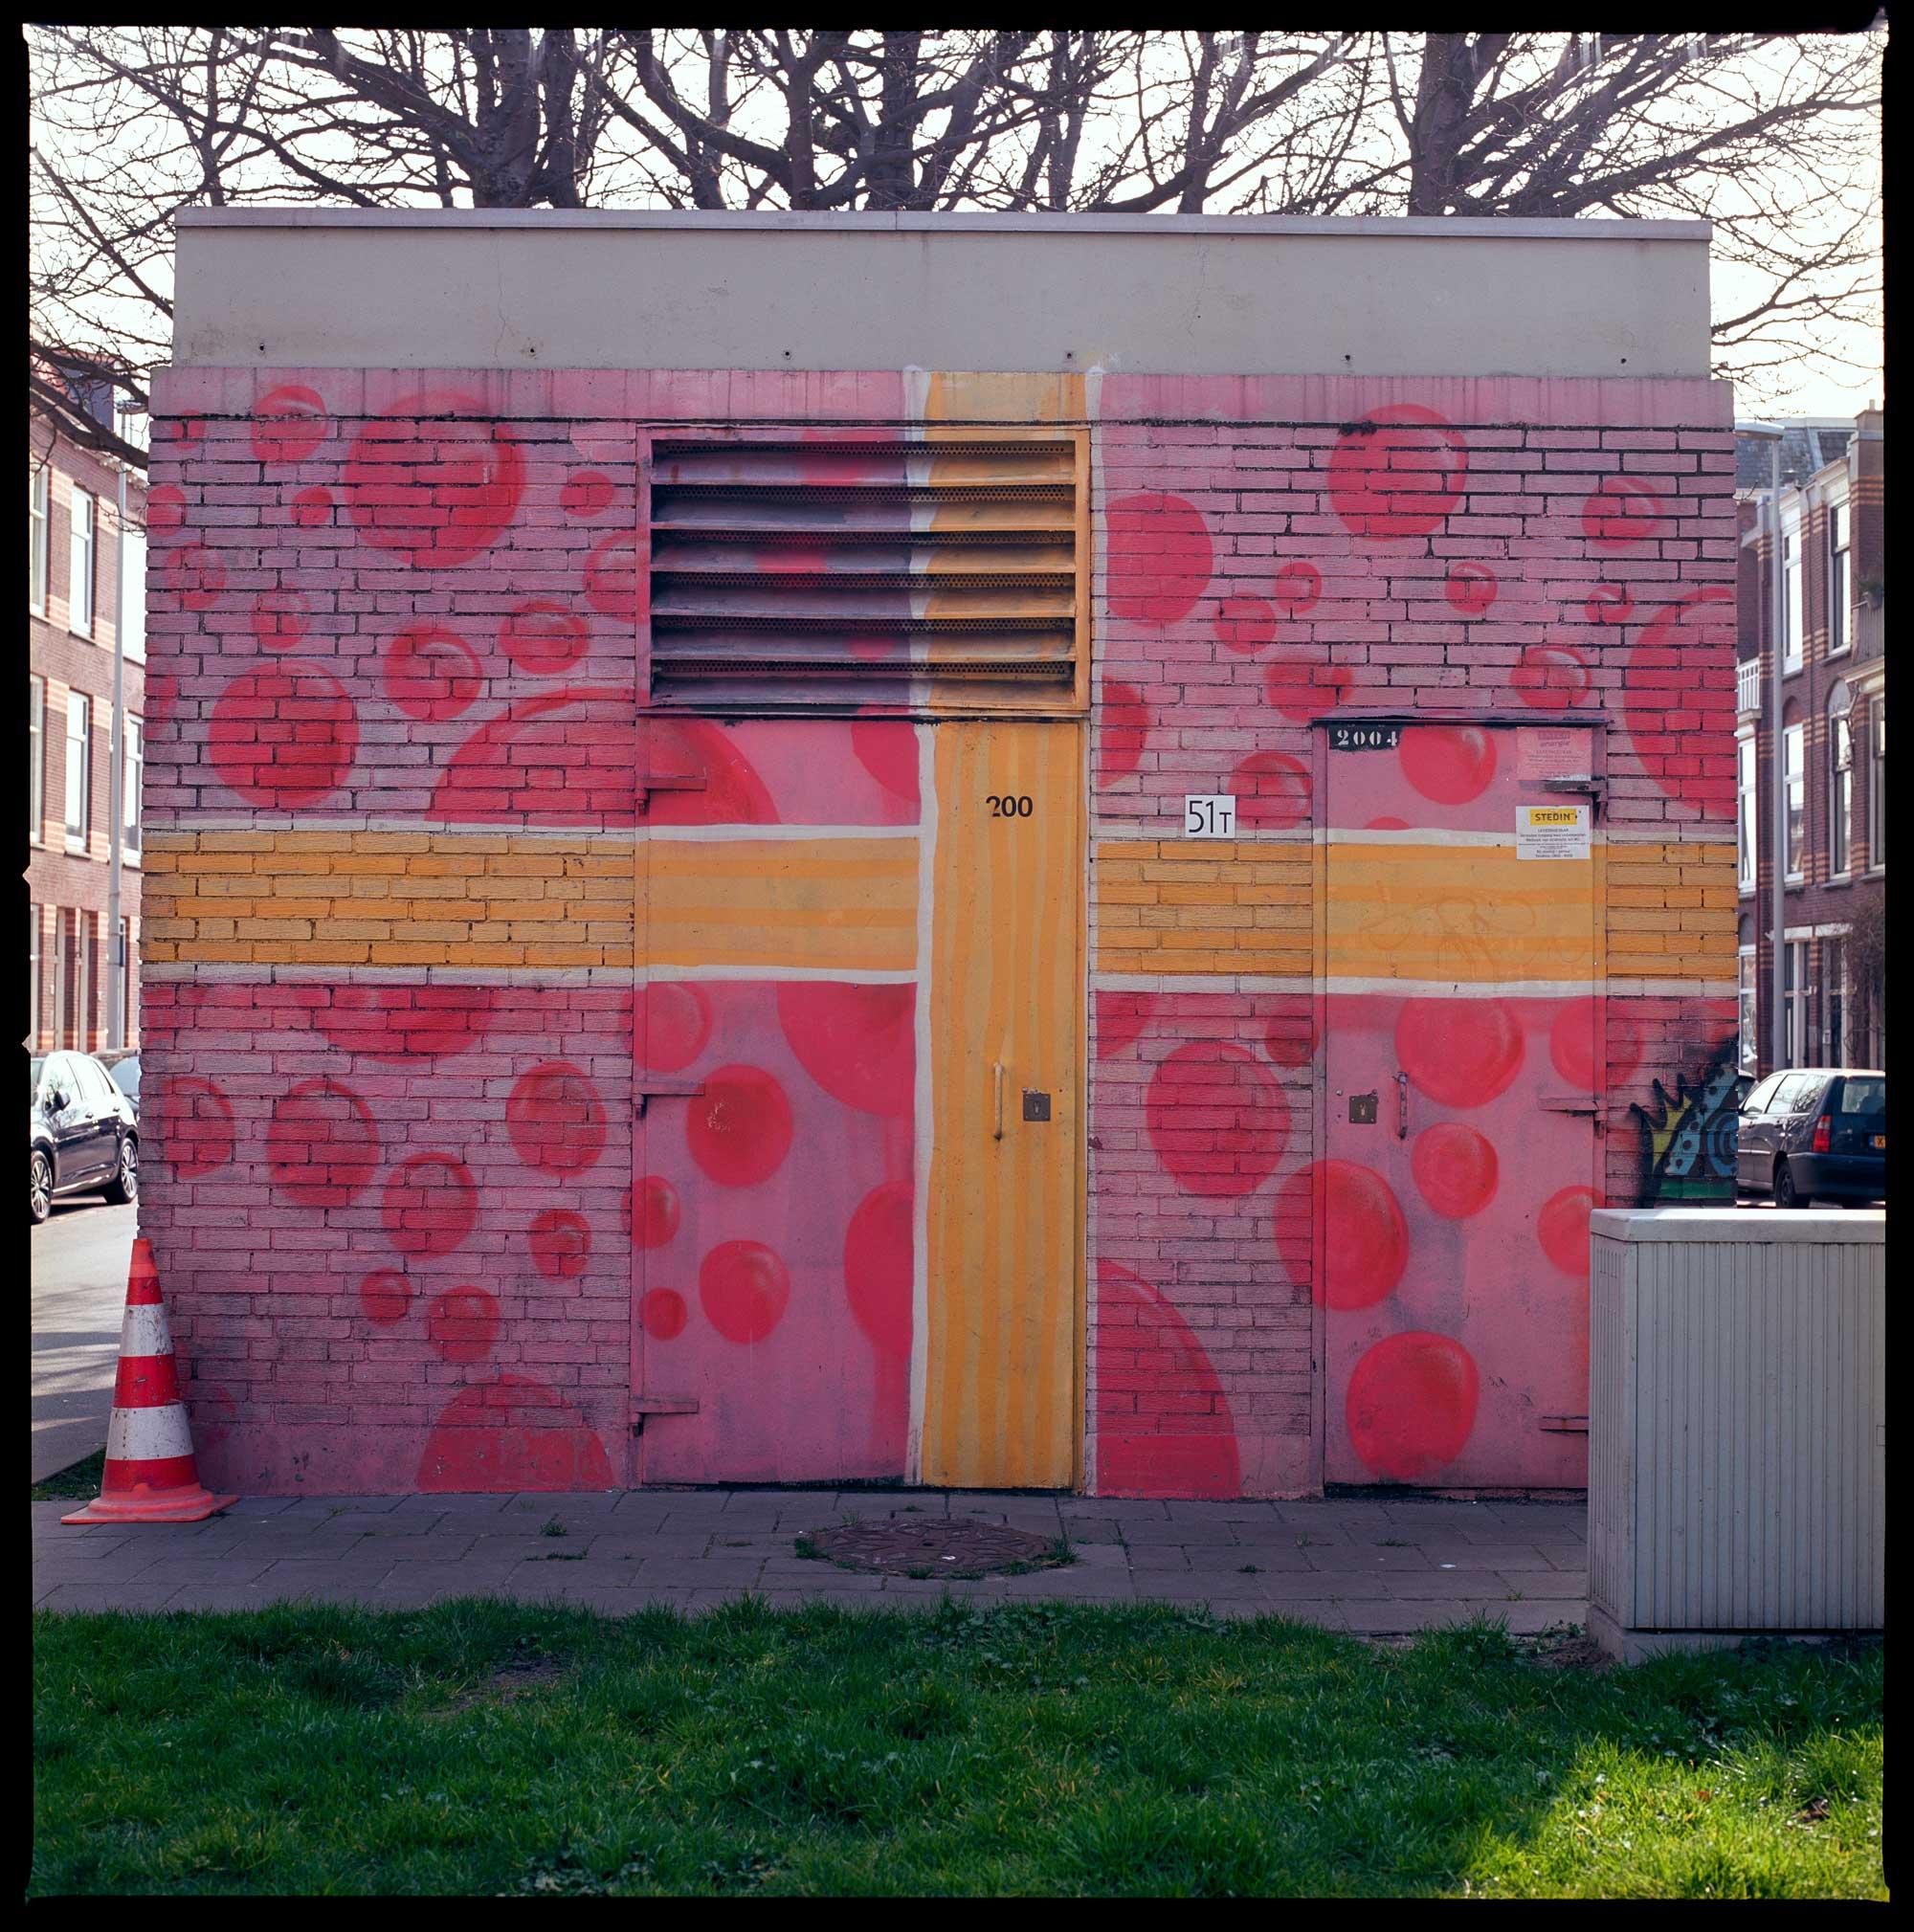 Wall Art The Hague